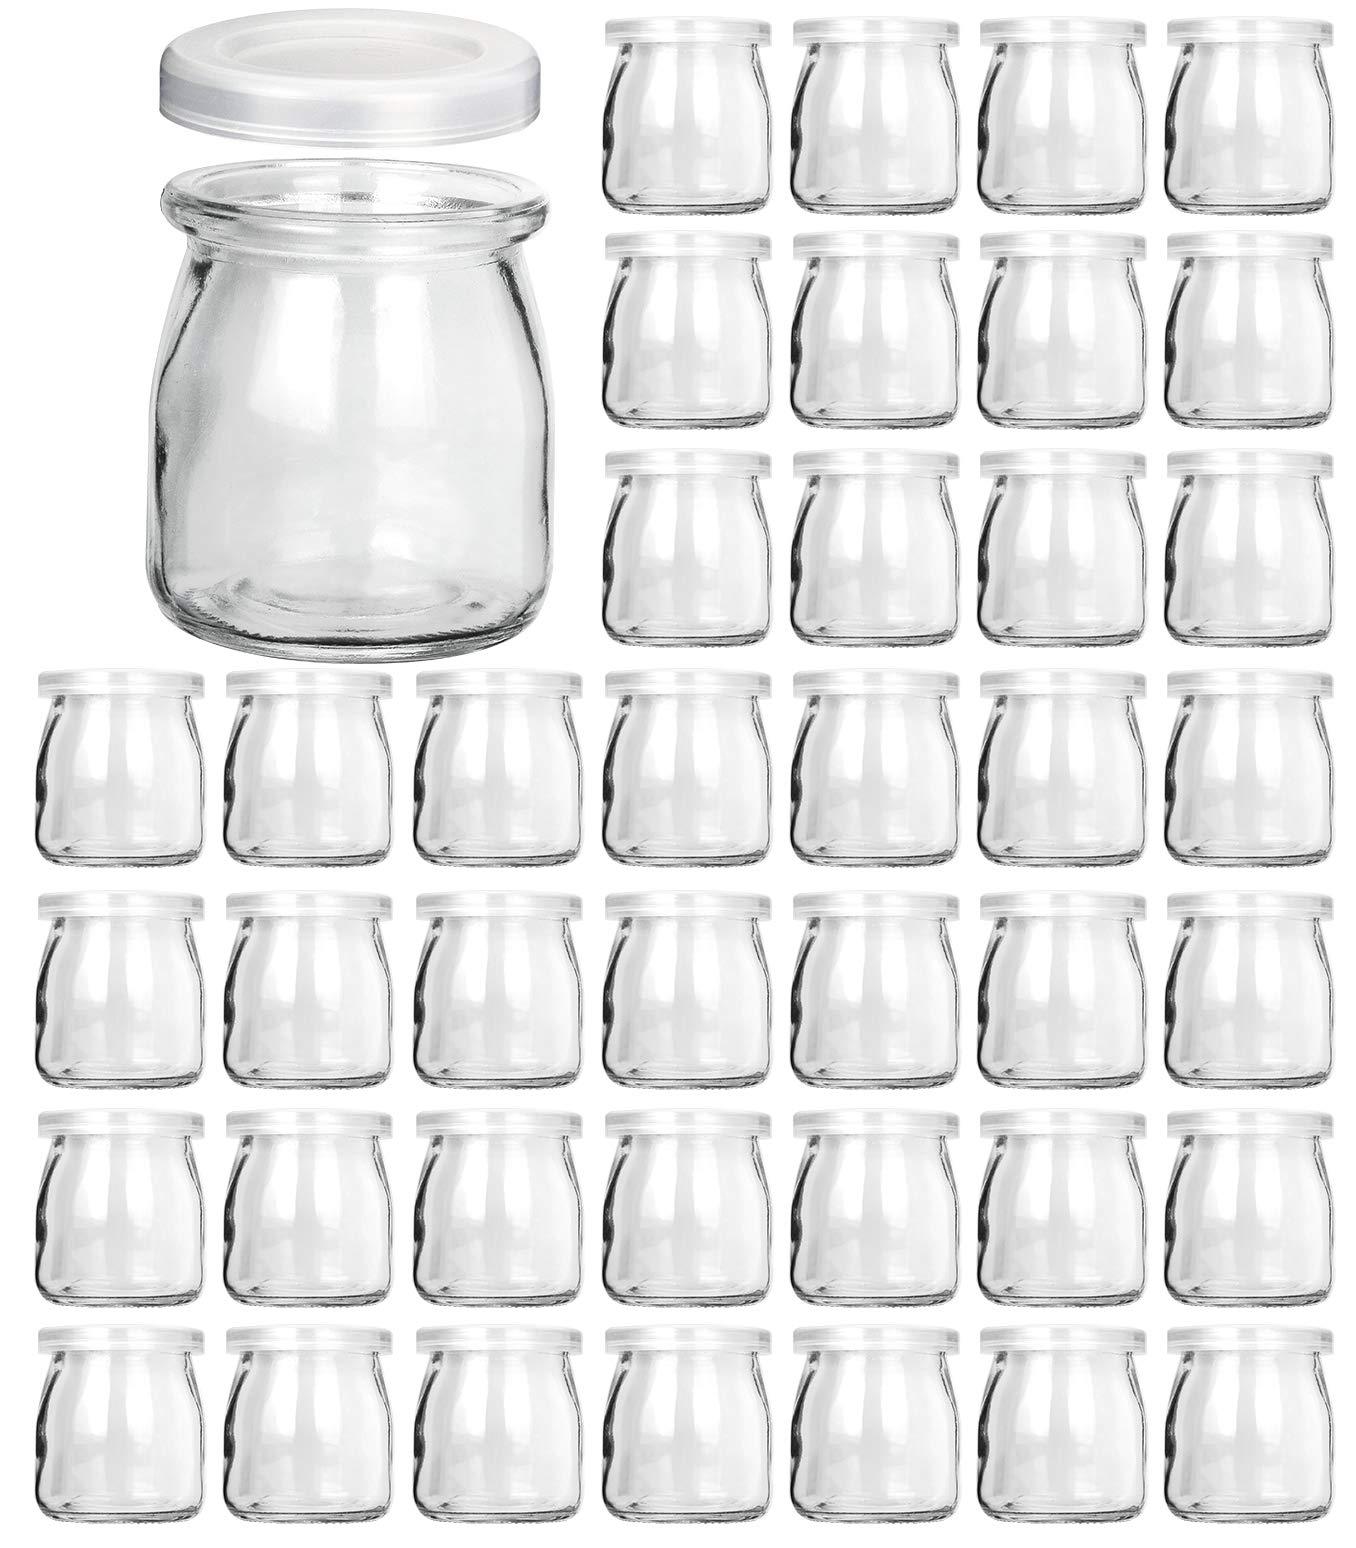 Glass Jars, KAMOTA 40 PACK 6oz Clear Yogurt Jars With PE Lids, Glass Pudding Jars Yogurt Jars Ideal for Jam, Honey, Wedding Favors, Shower Favors, Baby Foods (200ml) by KAMOTA